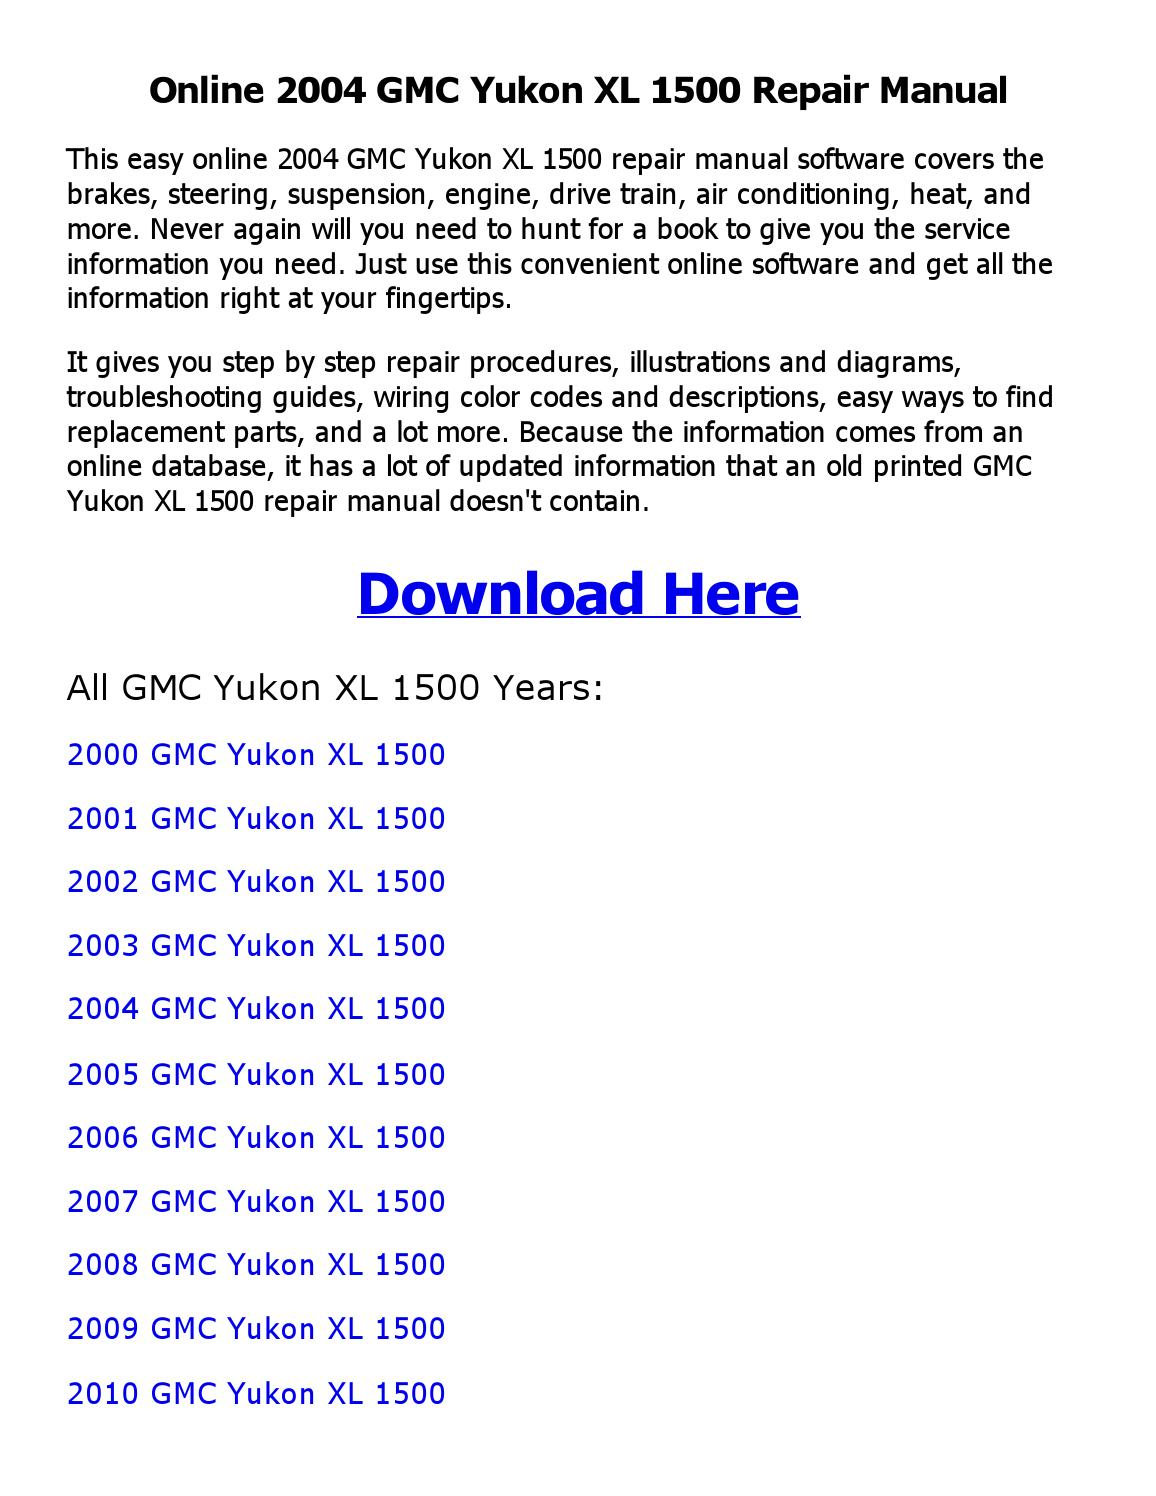 2004 Gmc Yukon Xl 1500 Repair Manual Online By Nkouedjo